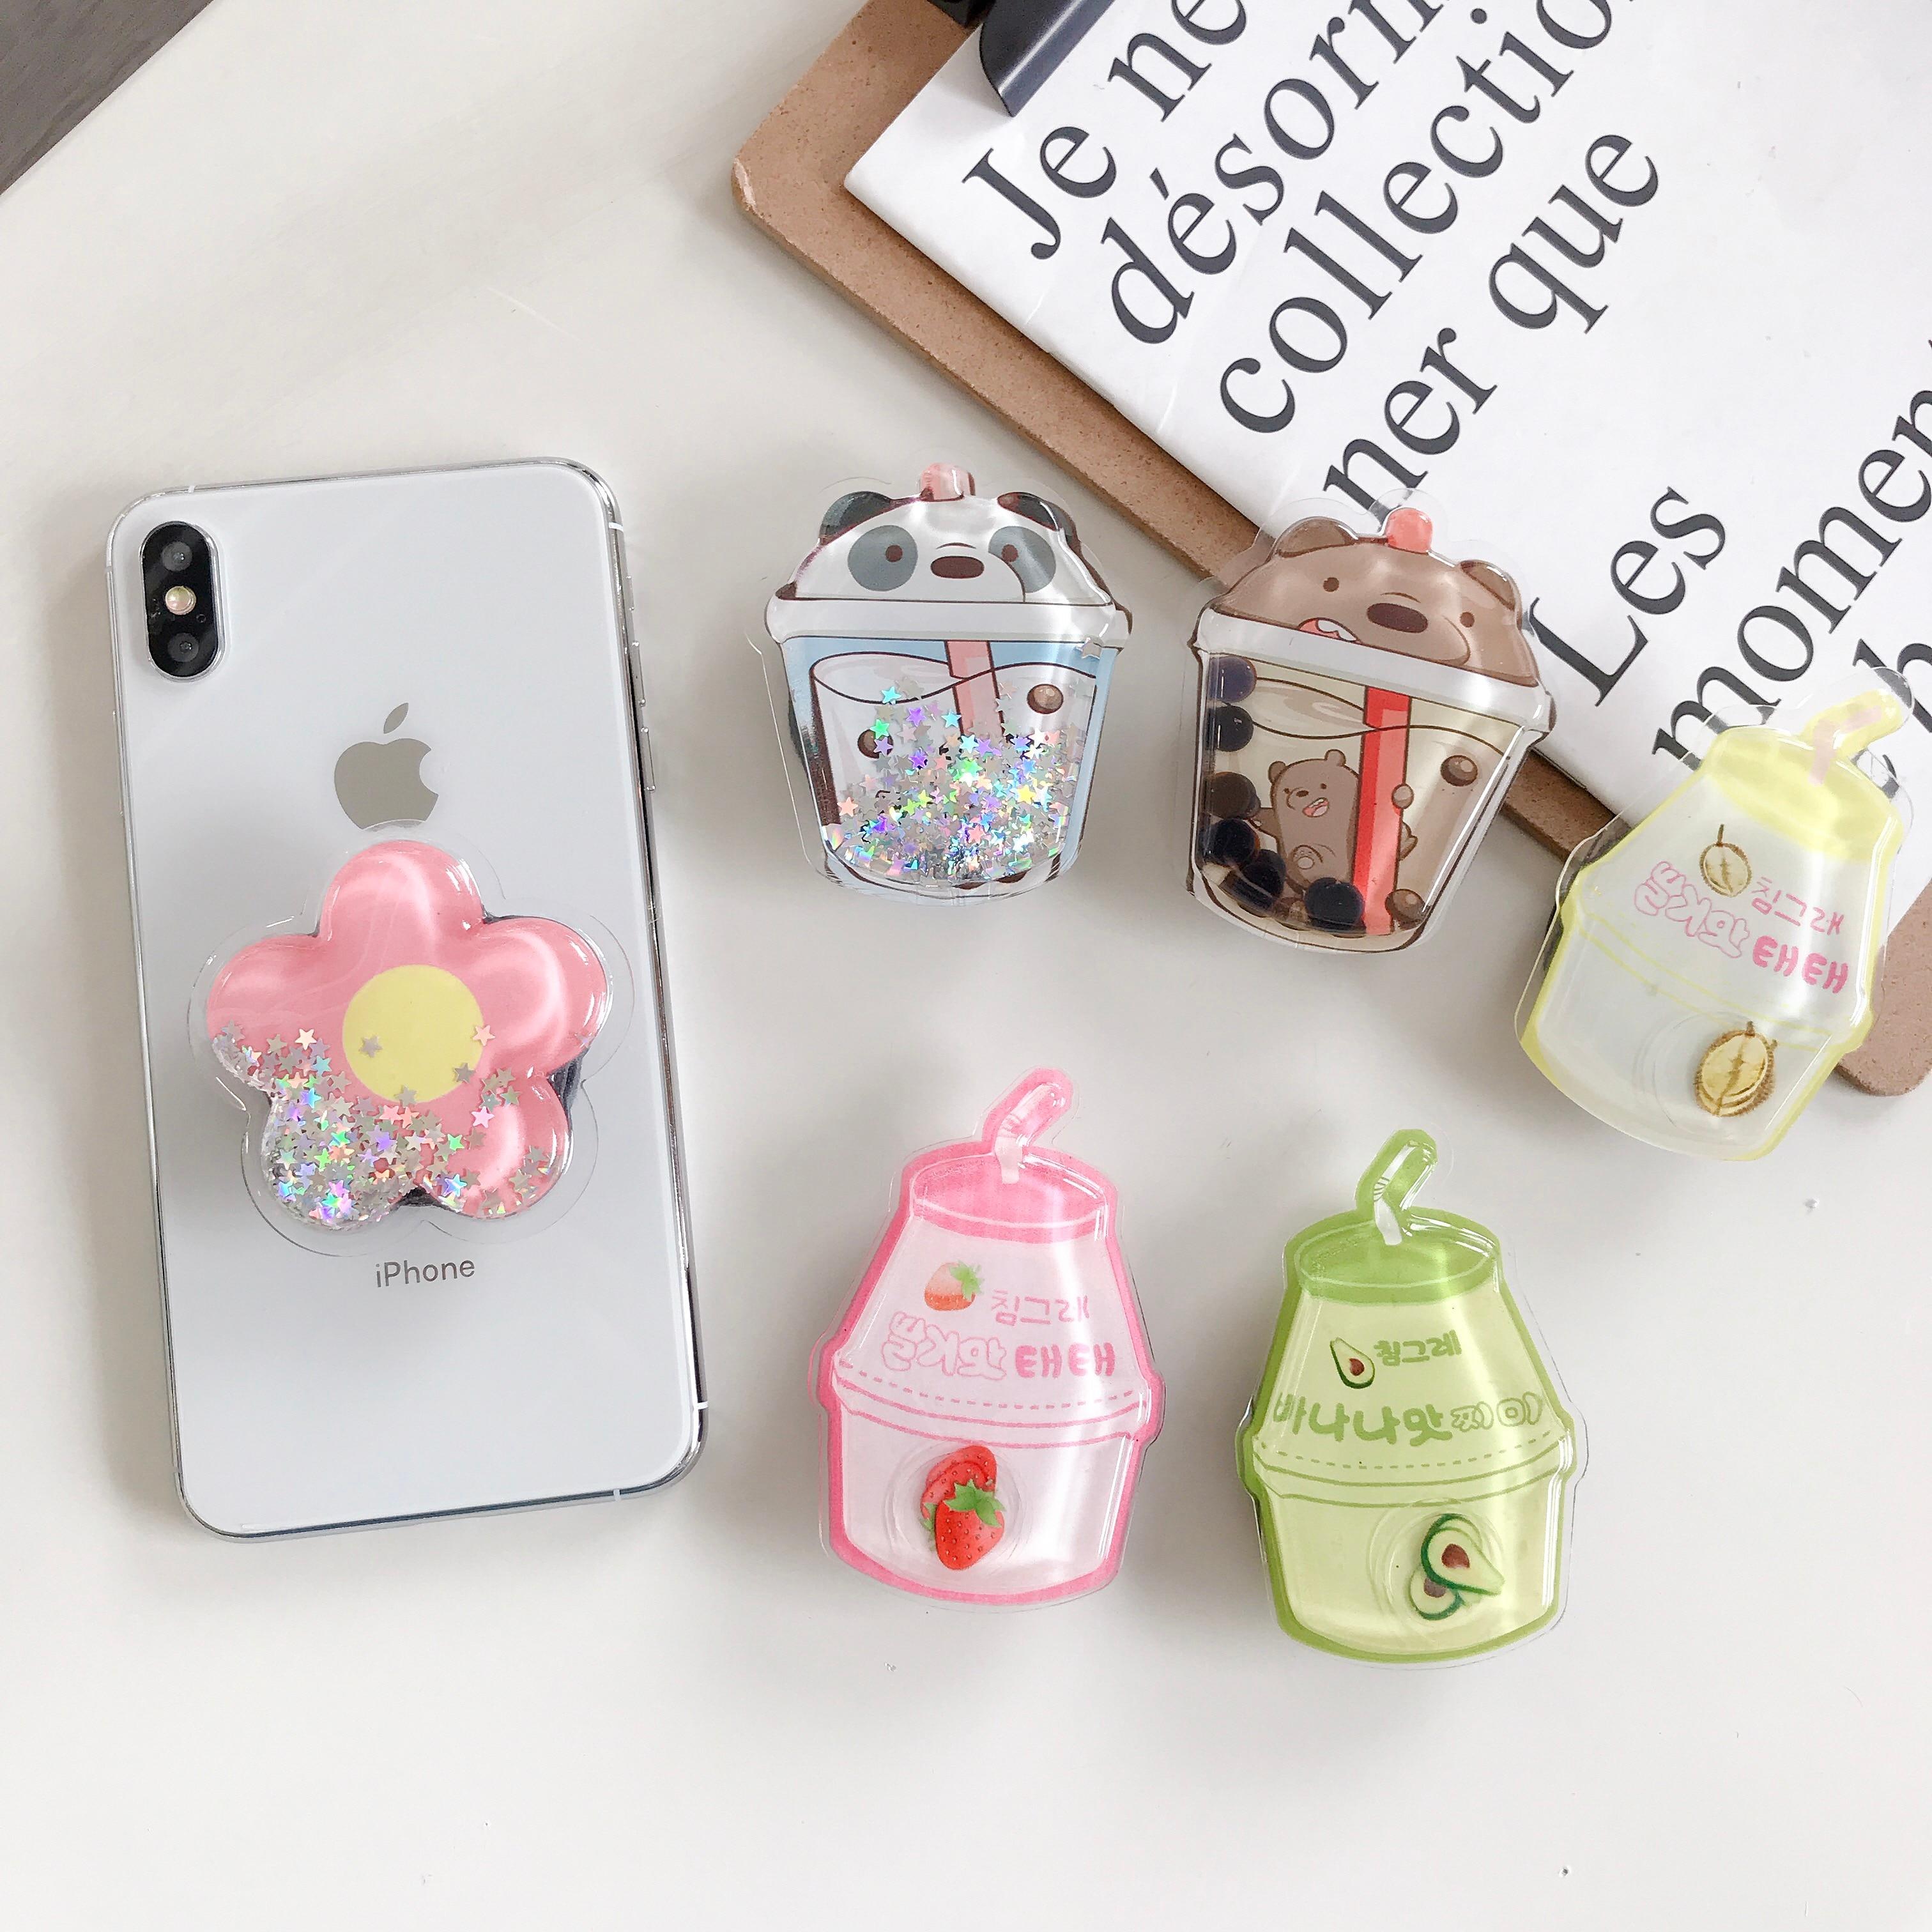 WholesaPPSocket Mobile Phone Soket Stretch Bracket Cartoon Air Bag Phone Expanding Phone Stand Finger Car Phone Holder Pipsocket